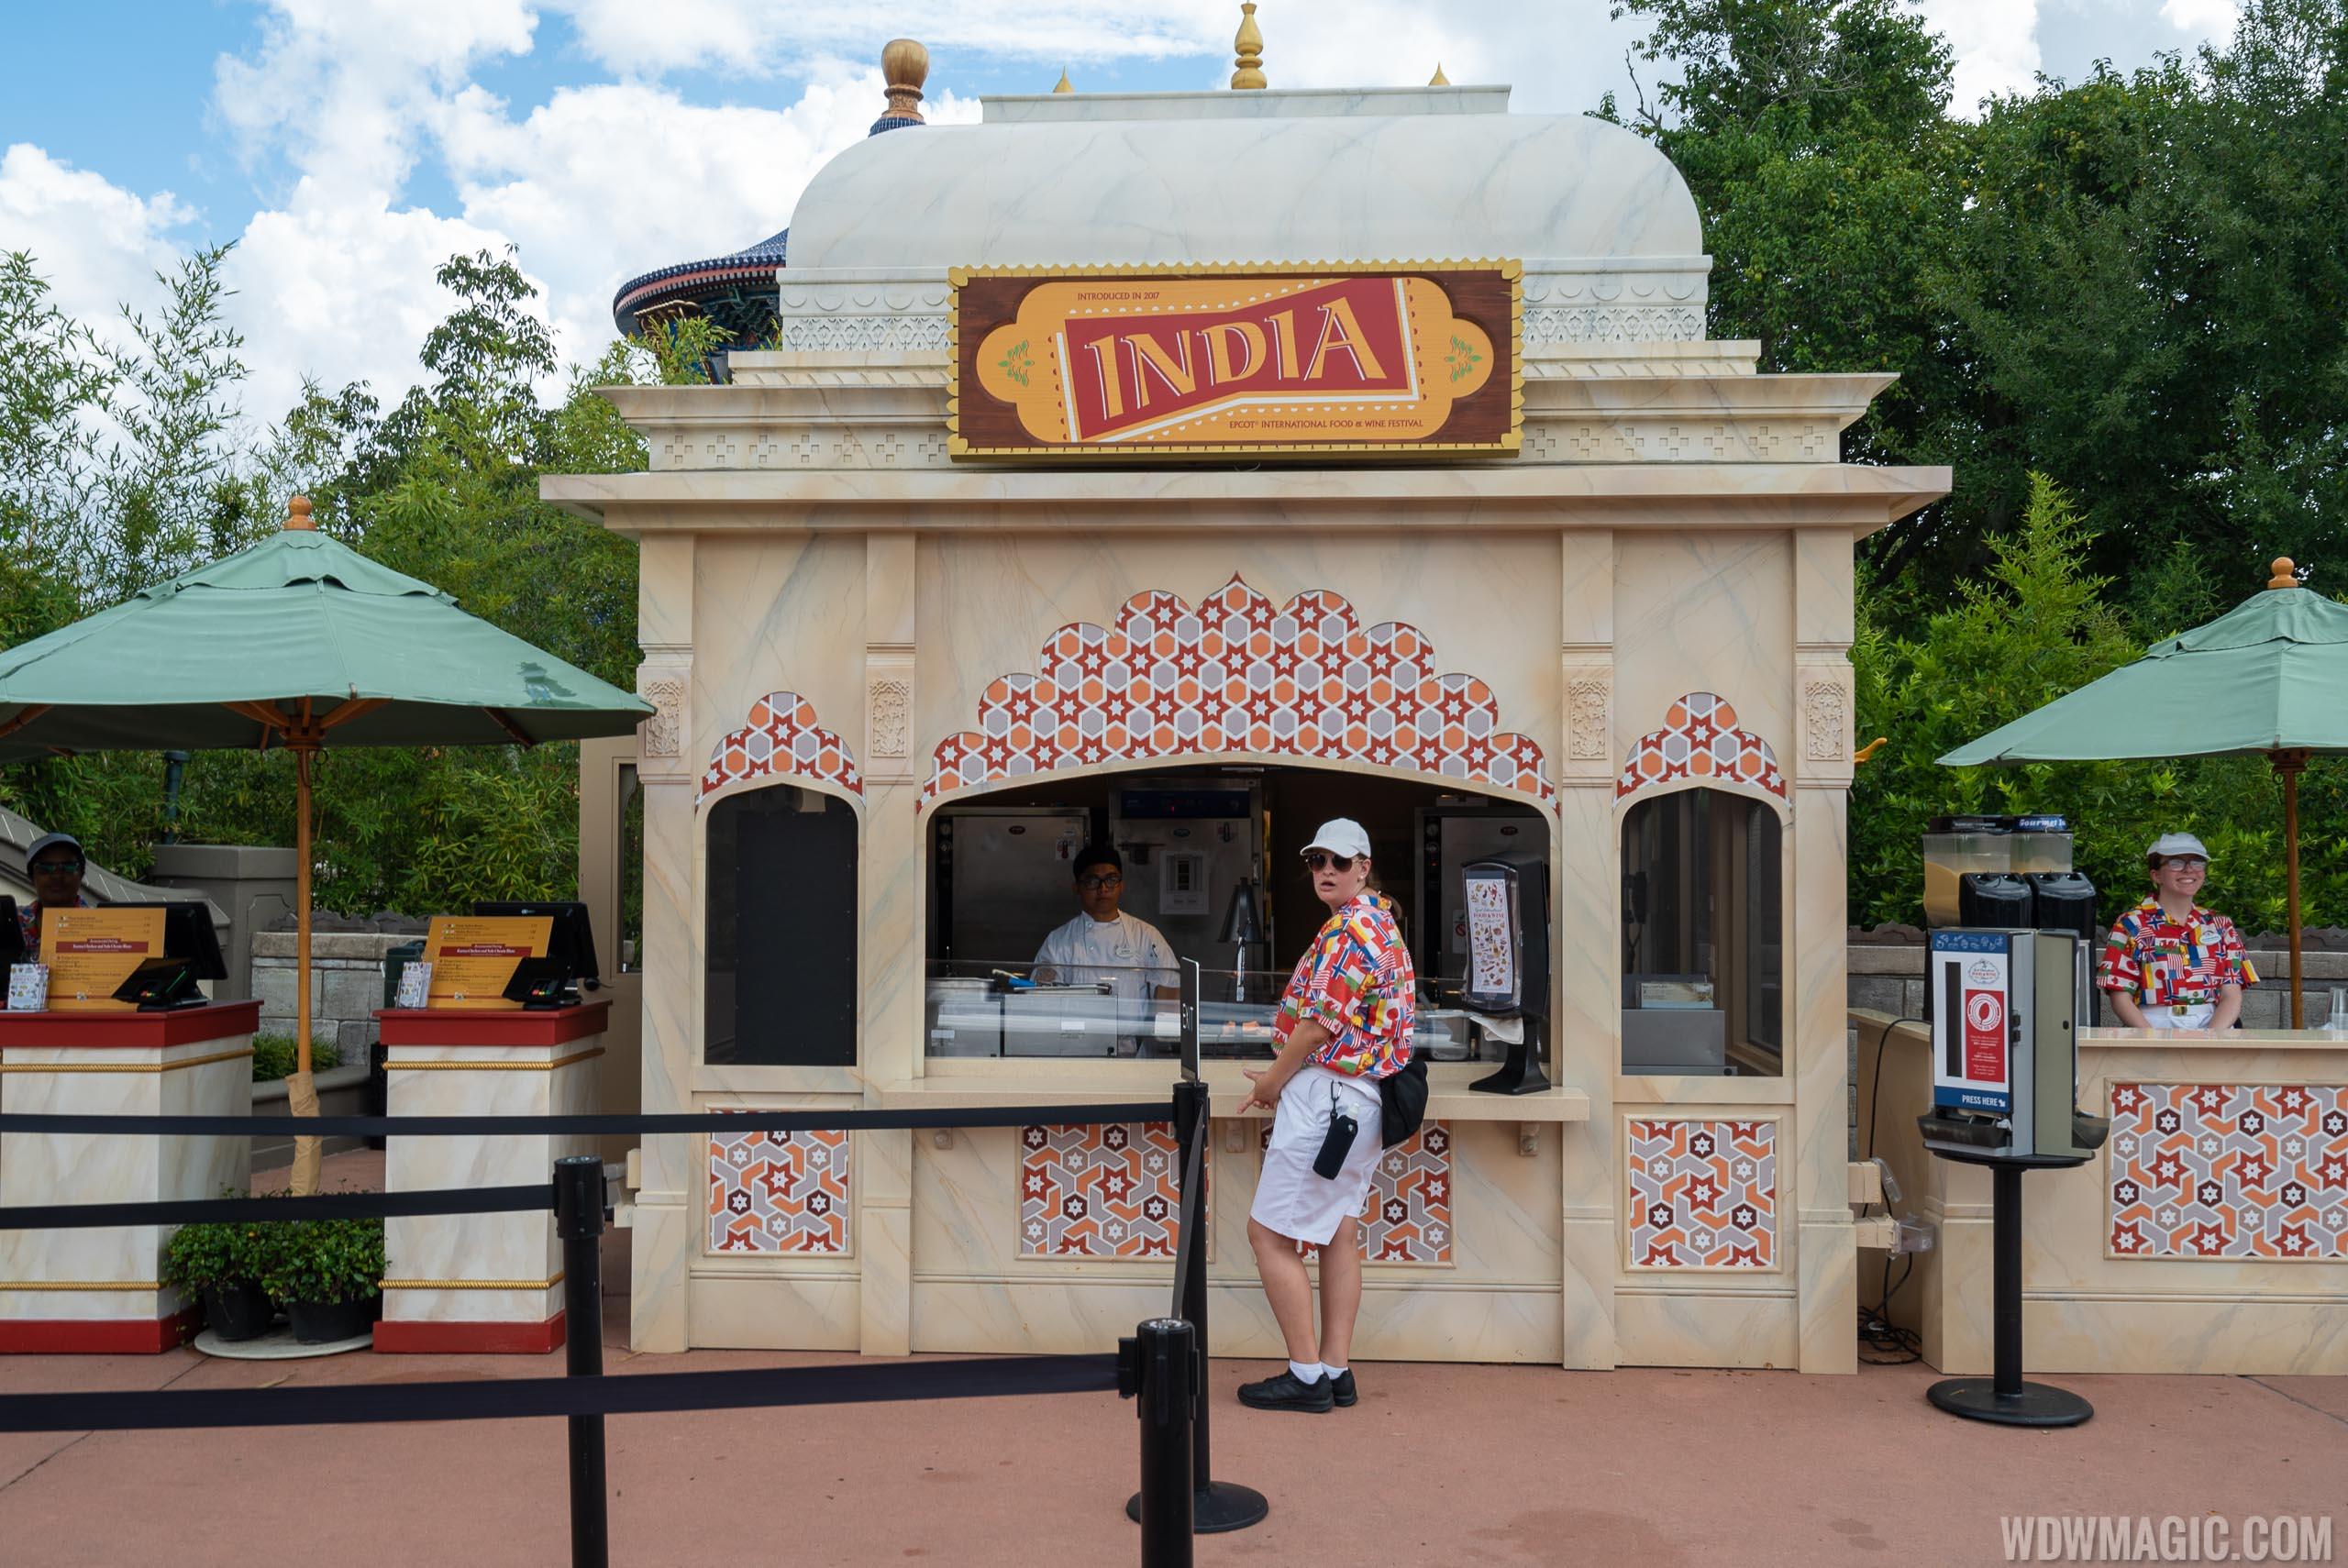 2019 Epcot Food and Wine Festival Marketplace kiosks, menus